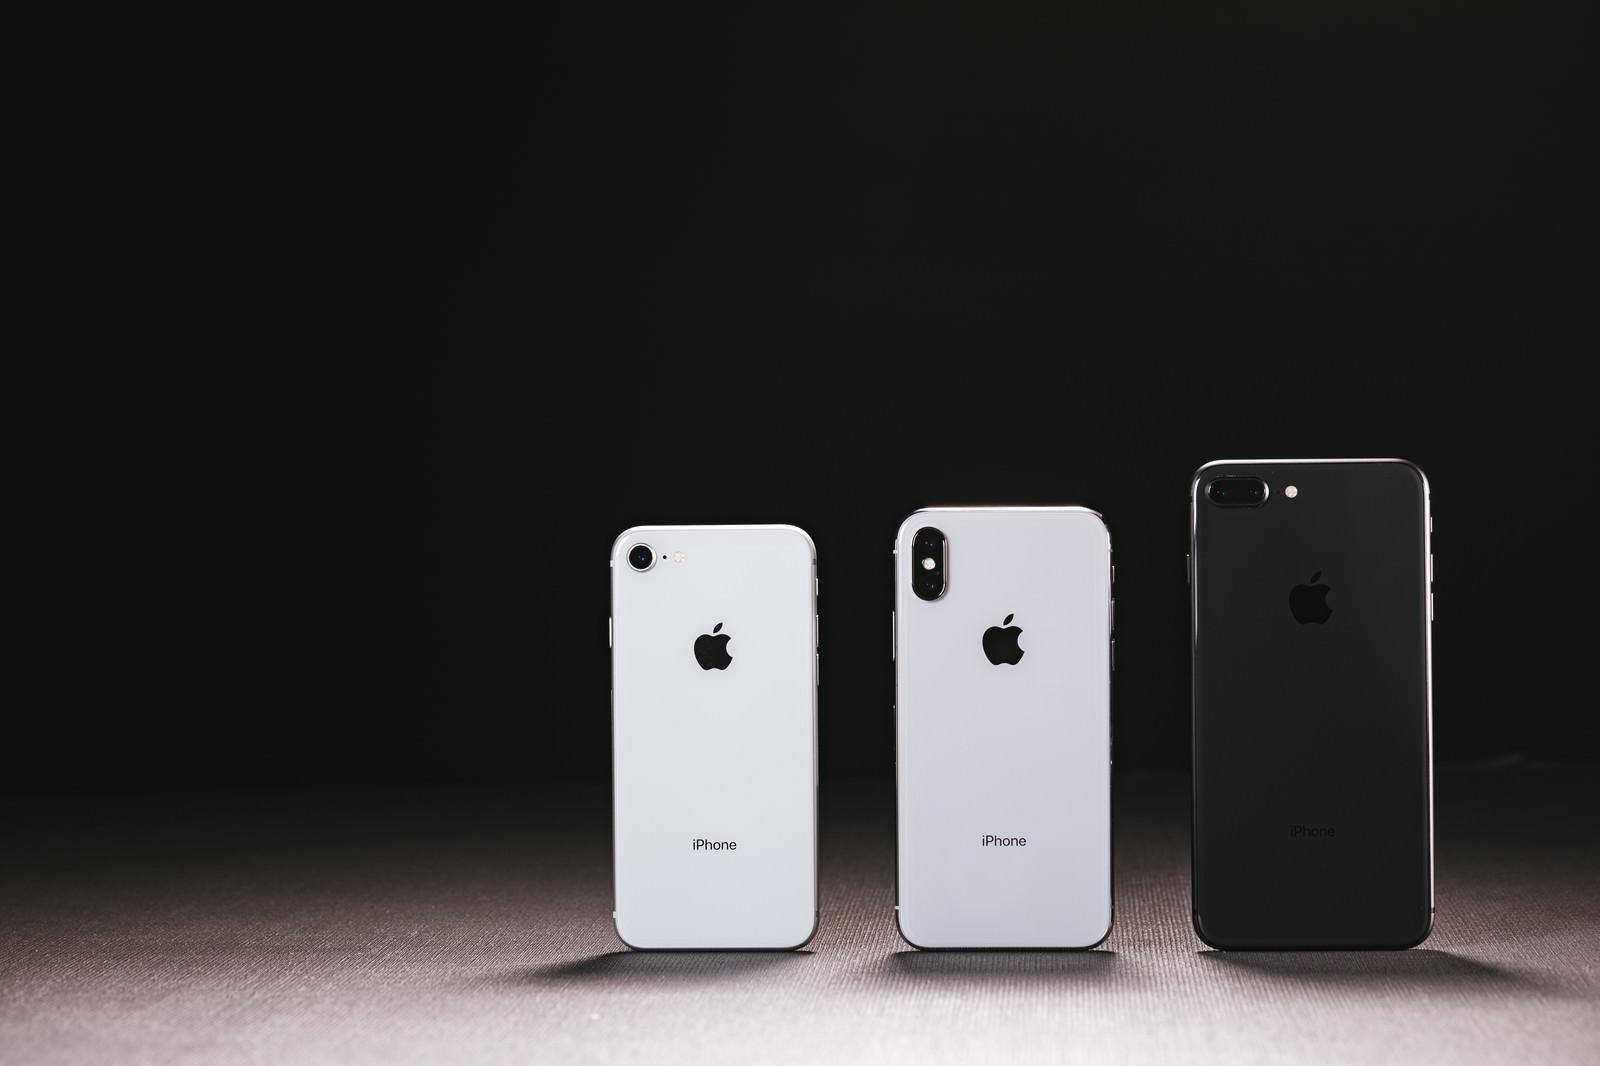 「iPhone X(テン)と iPhone 8 の外観」の写真